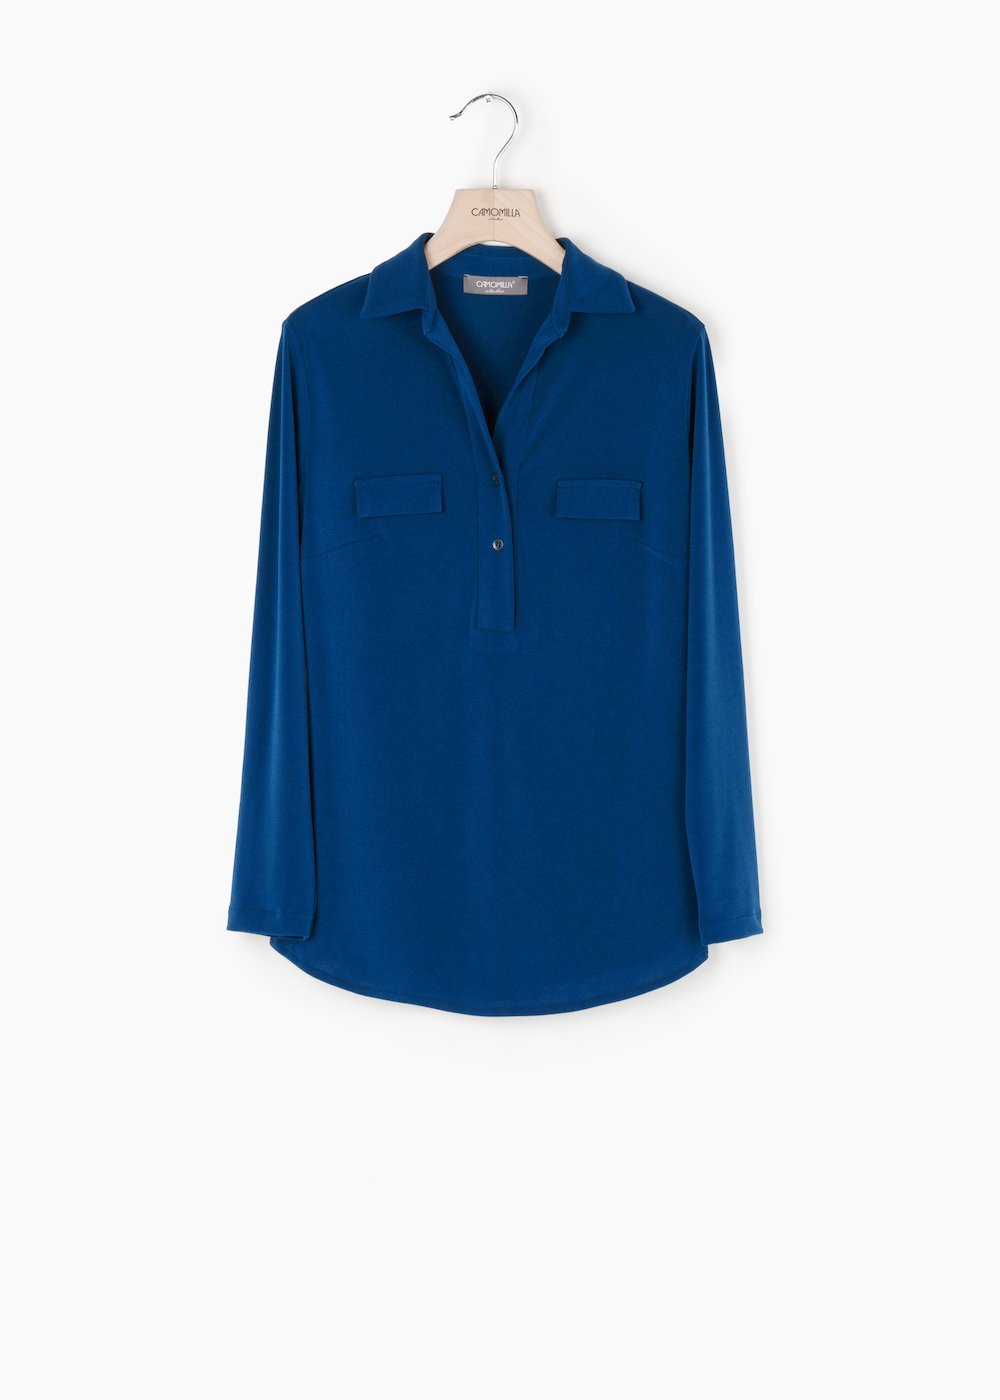 Paola crêpe t-shirt with shirt collar - Medium Blue - Woman